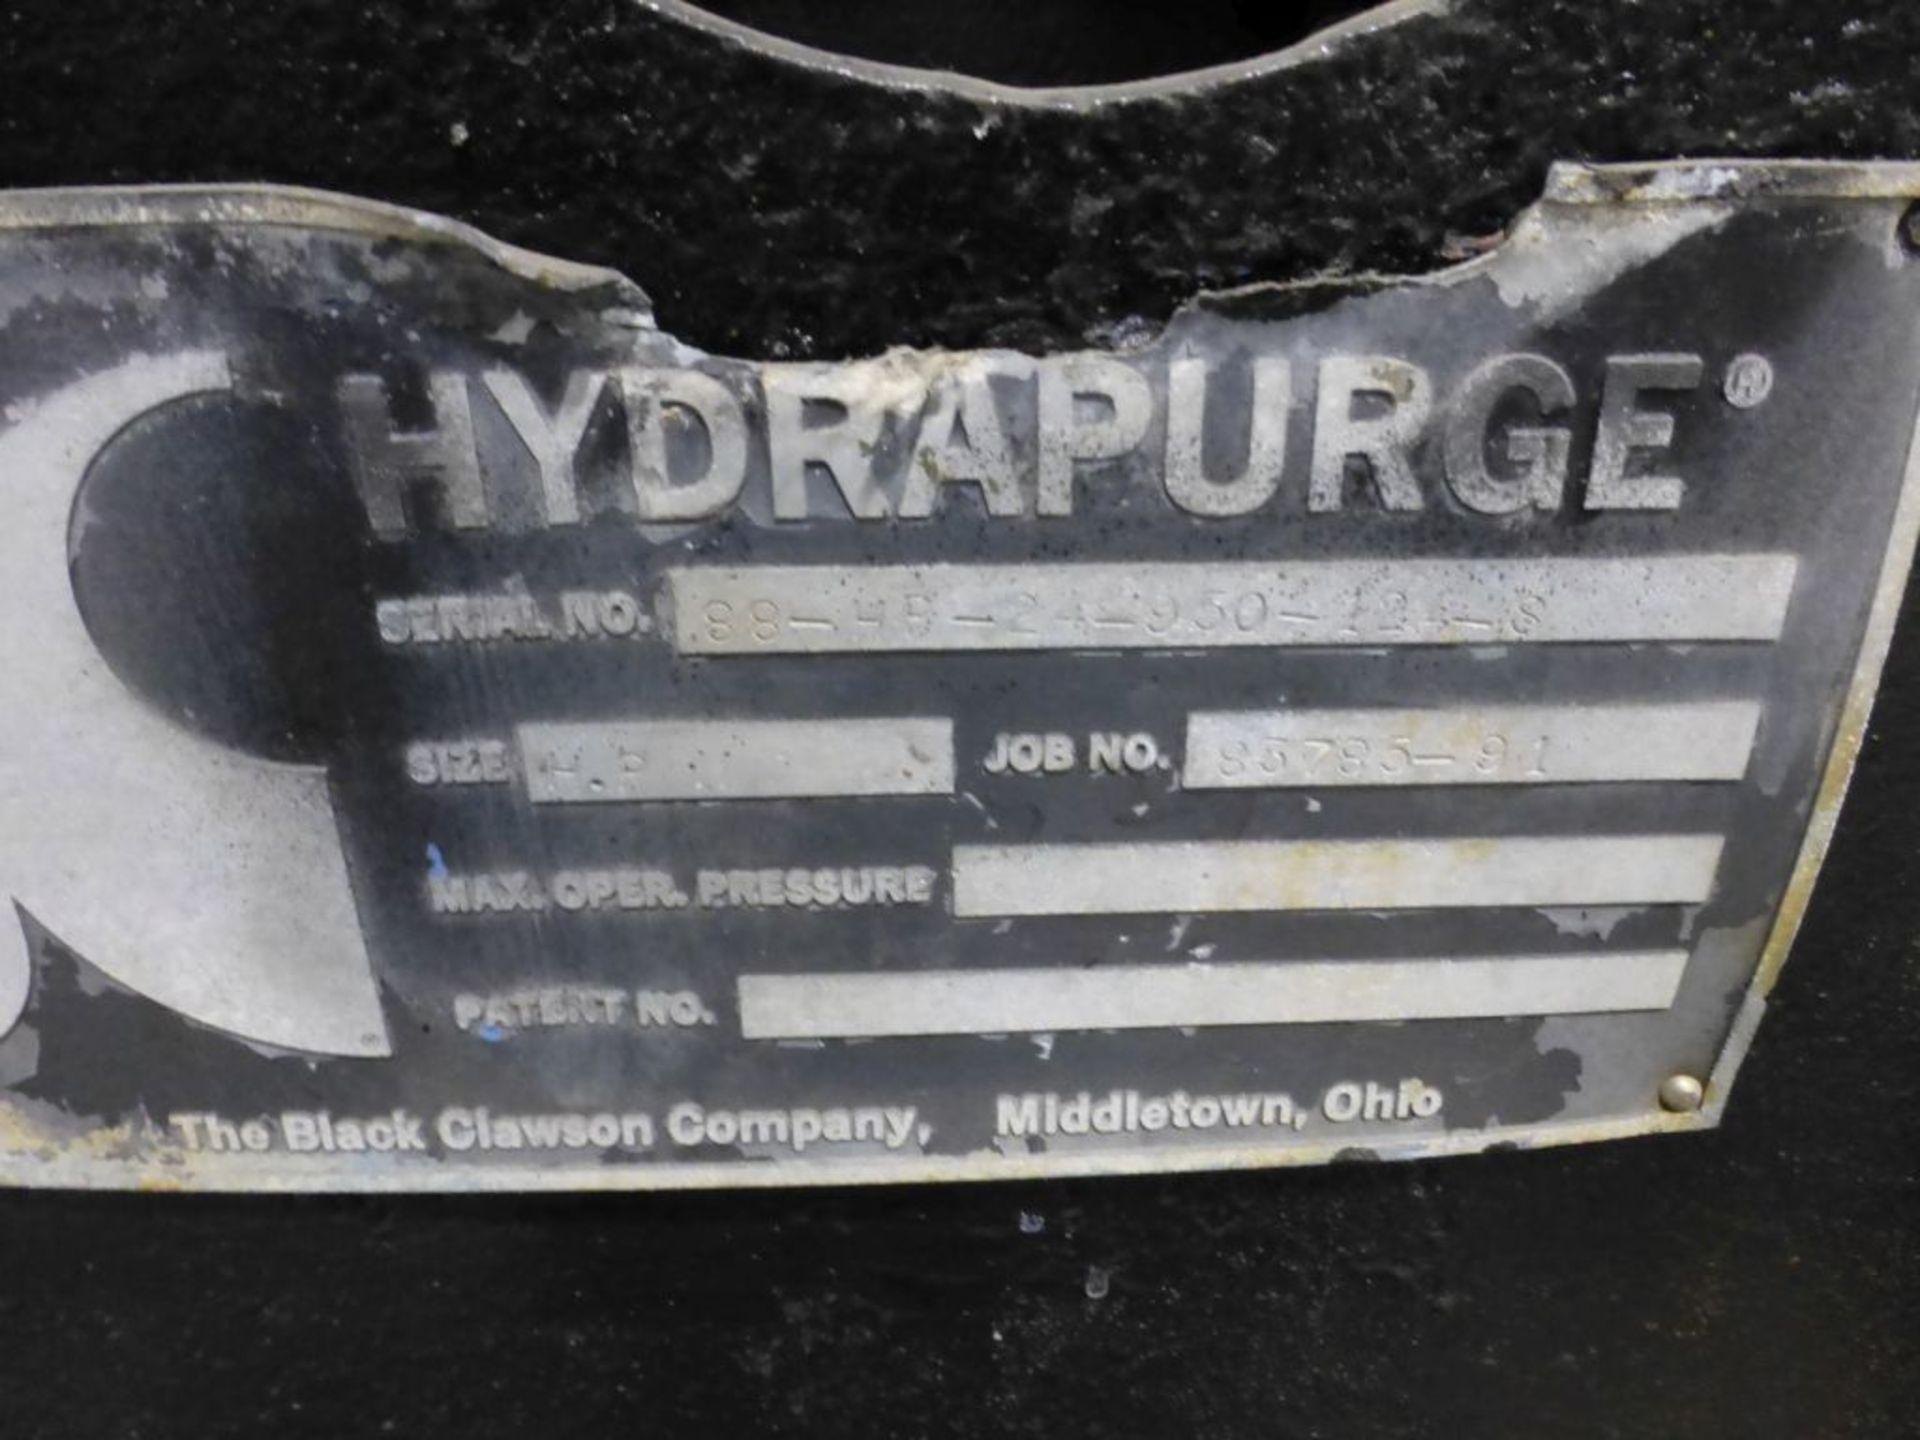 Kadant Black Clawson Size II Hydrapurge | Serial No. 88-HP-24-950-124-S; Size: HP 11 - Image 7 of 8